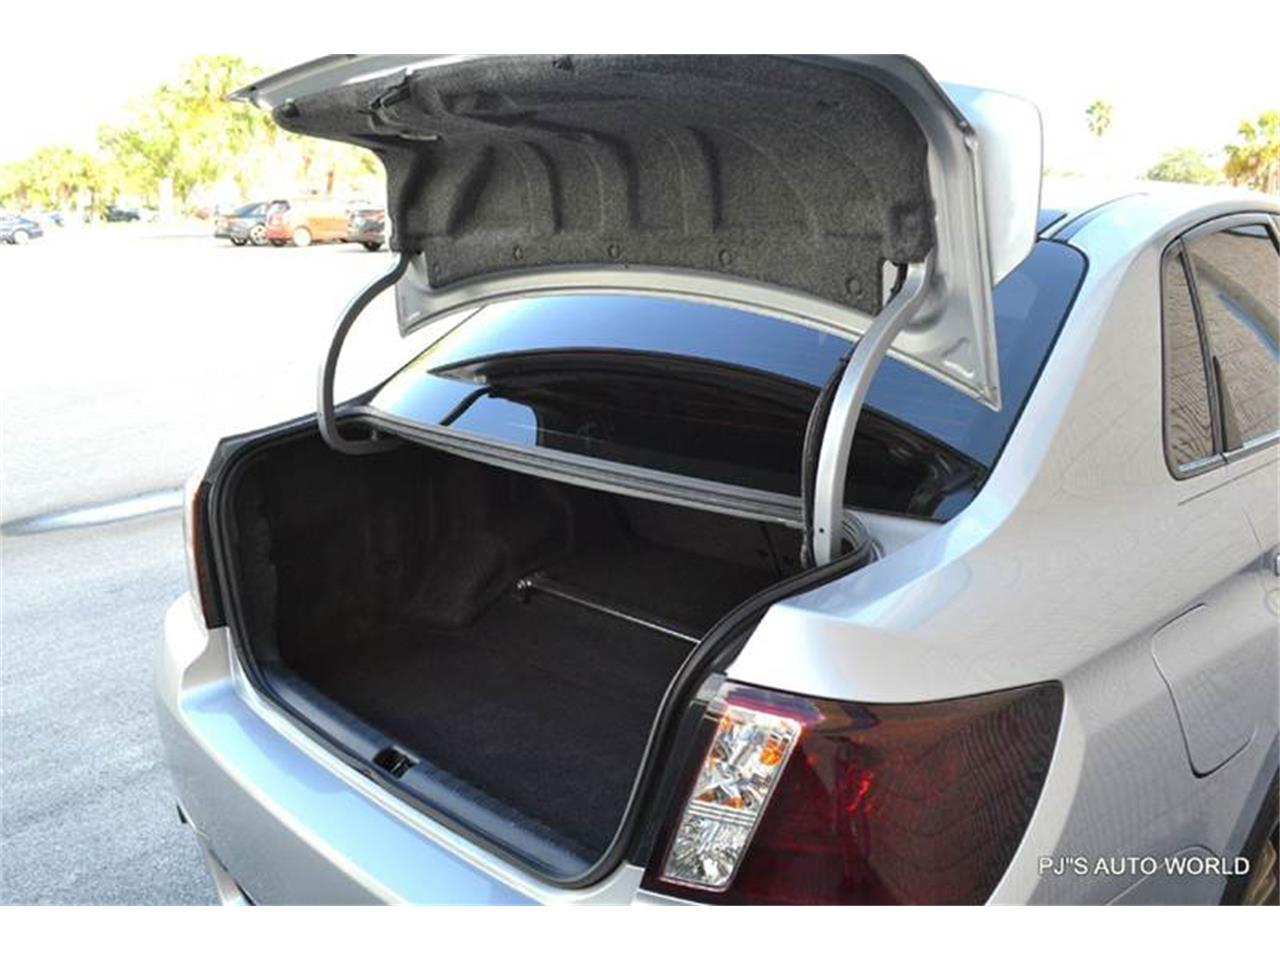 Large Picture of 2013 Subaru Impreza located in Clearwater Florida - $19,900.00 - J6WM